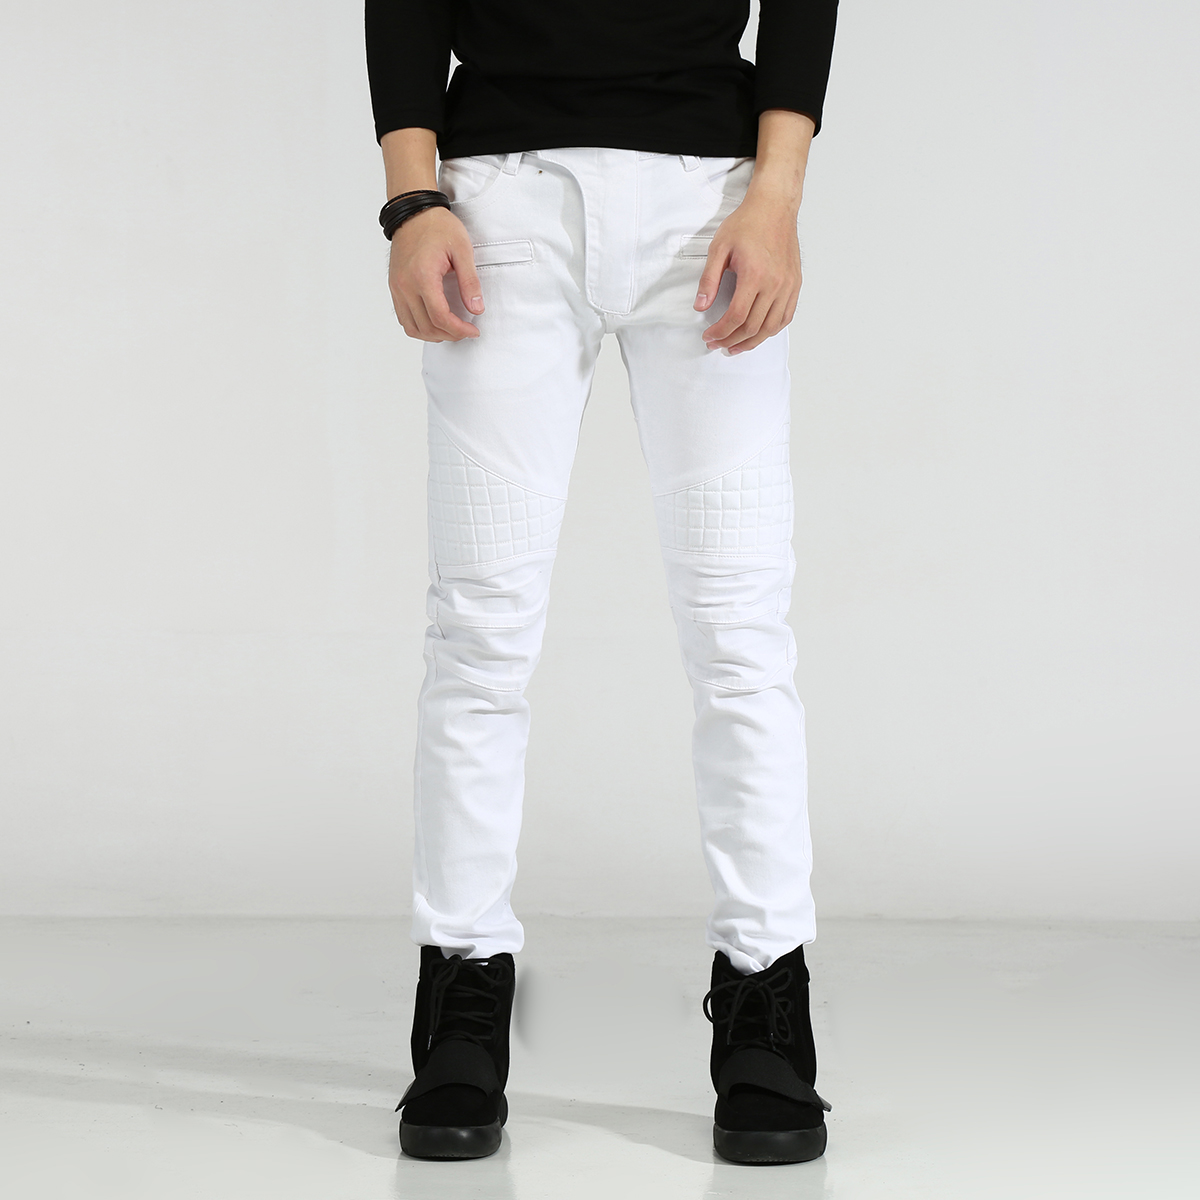 Men Jeans Slim Fit Elastic White Jeans Men Casual Biker Jeans Straight Denim Skinny Men Bermuda Jeans Masculina 2017 fashion spring jeans hip hop men rider biker jeans masculina casual denim men s slim jeans pants brand skinny jeans homme